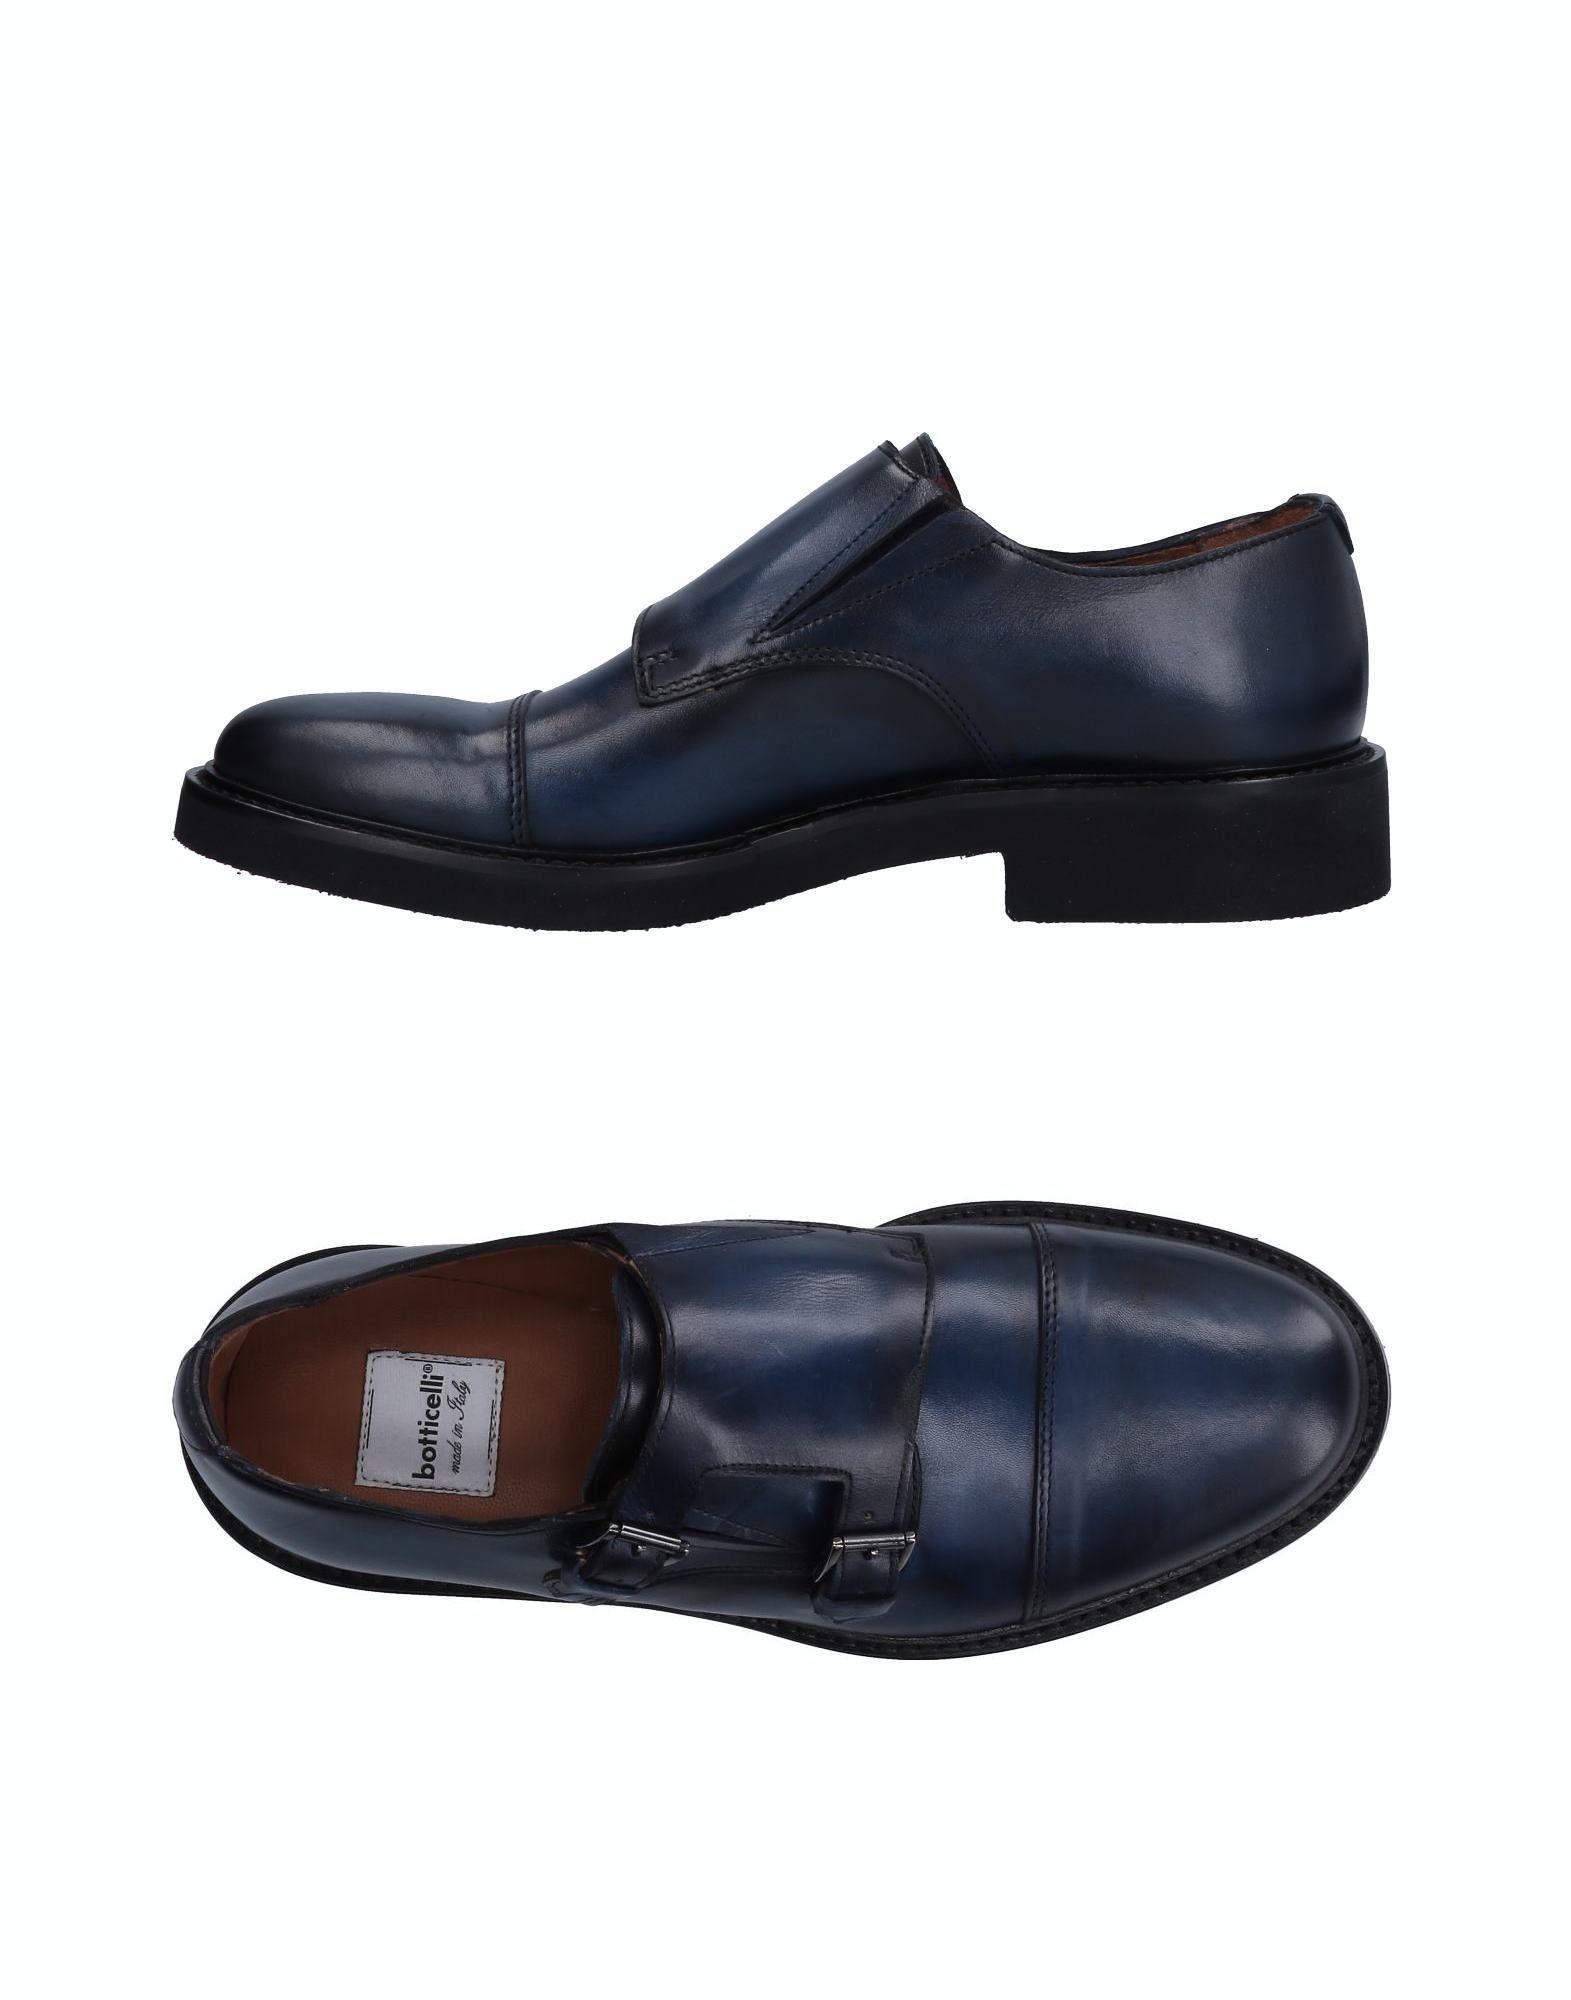 Roberto Botticelli Mokassins Herren  11519533BD Gute Qualität beliebte Schuhe